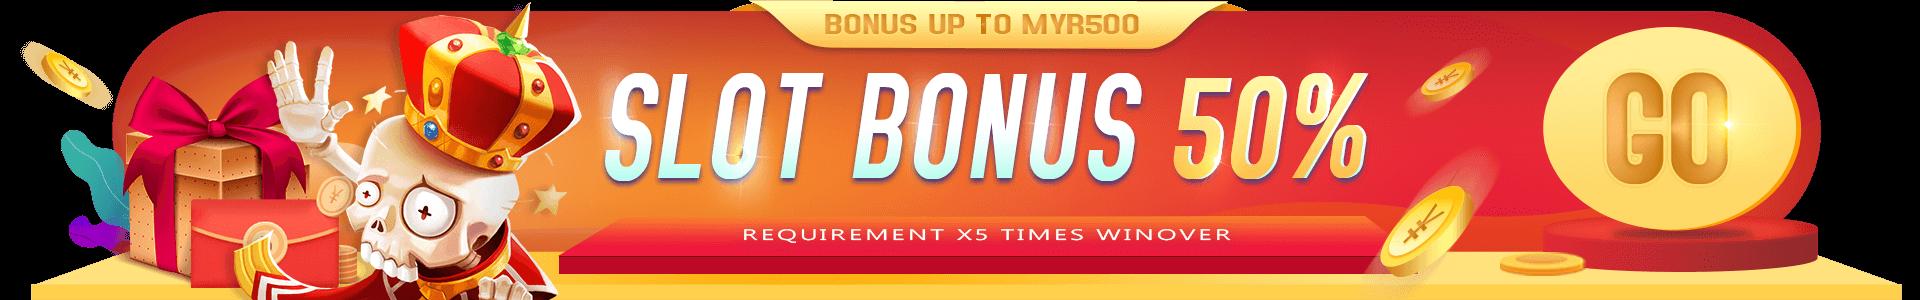 918kiss Slot Welcome Bonus 50%